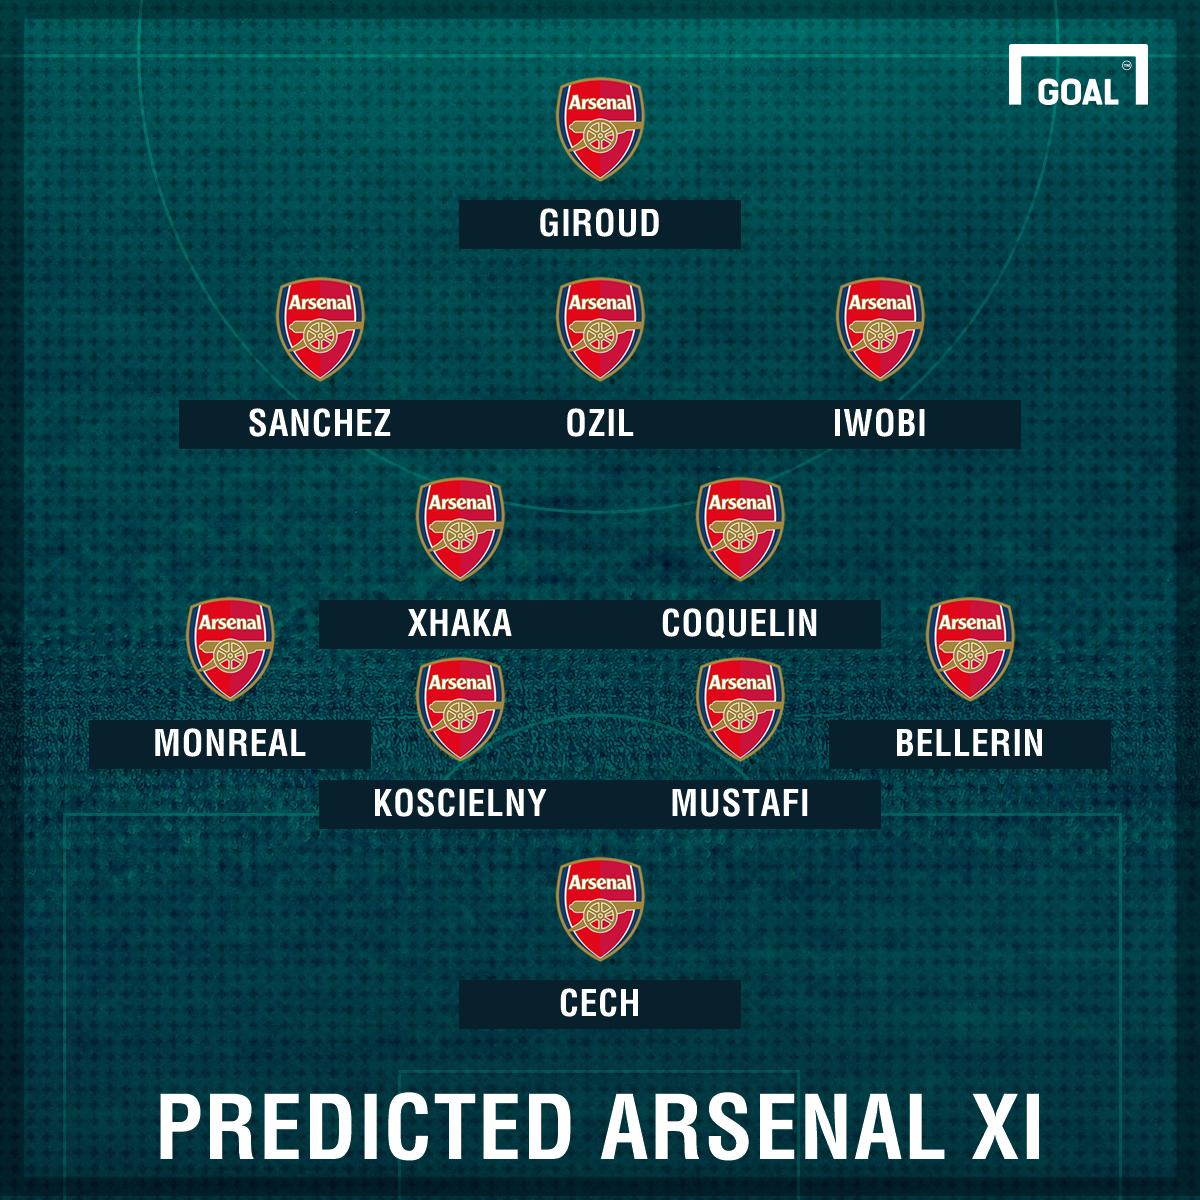 Predicted Arsenal Xi